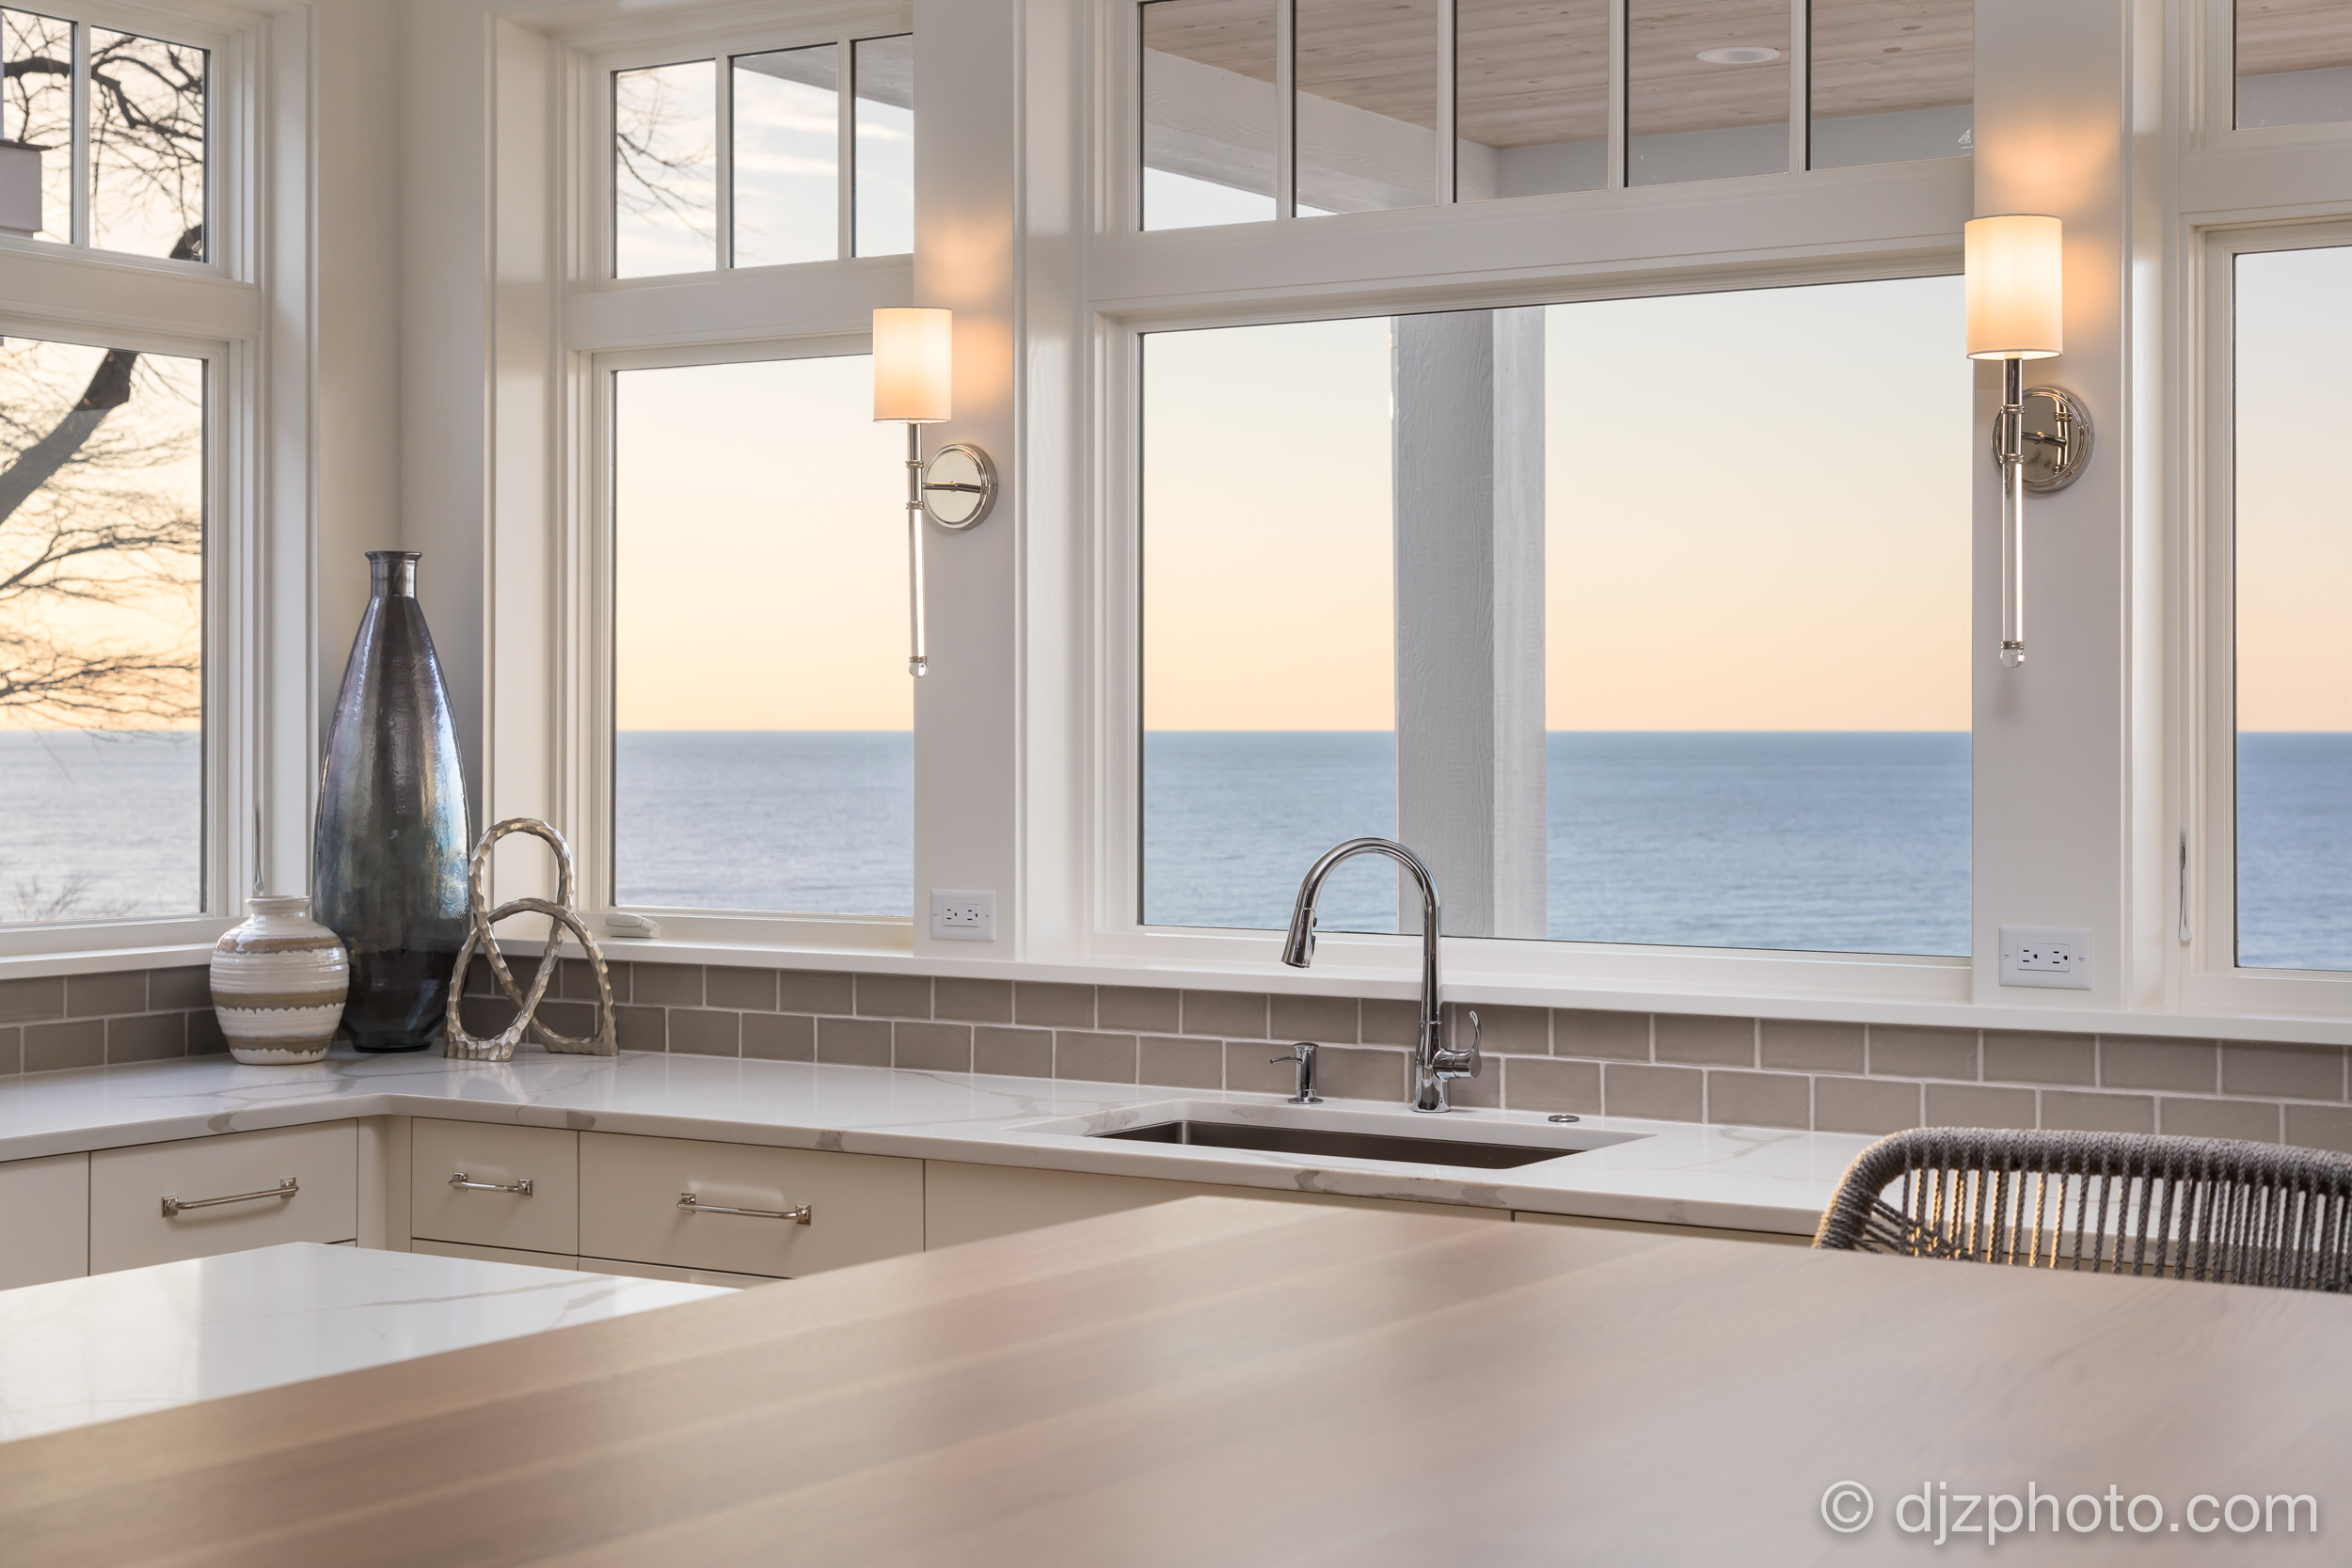 Kitchen Overlooking Lake Michigan